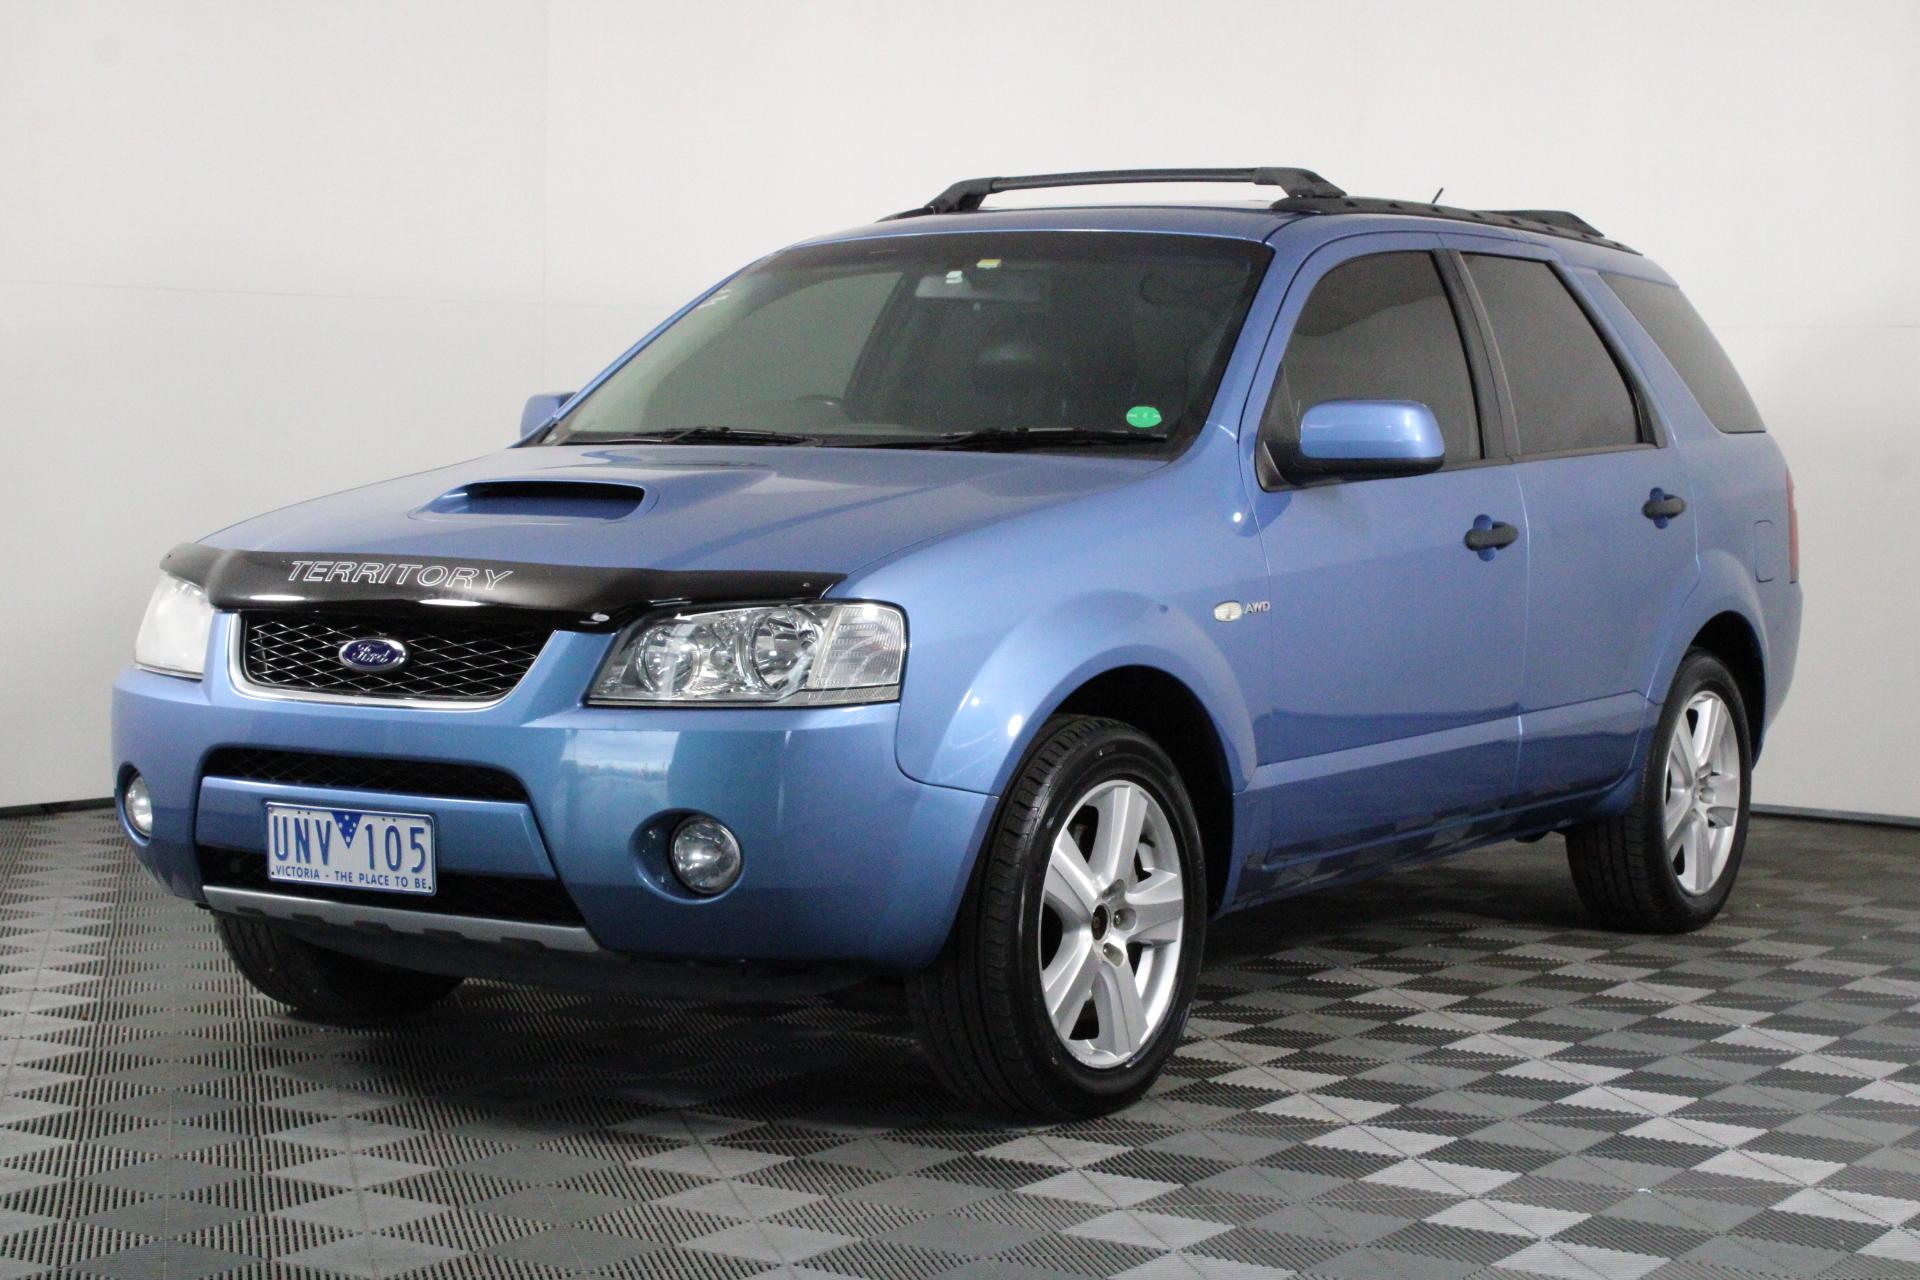 2006 Ford Territory Ghia Turbo AWD SY (Modified: 280kW at wheels) Wagon